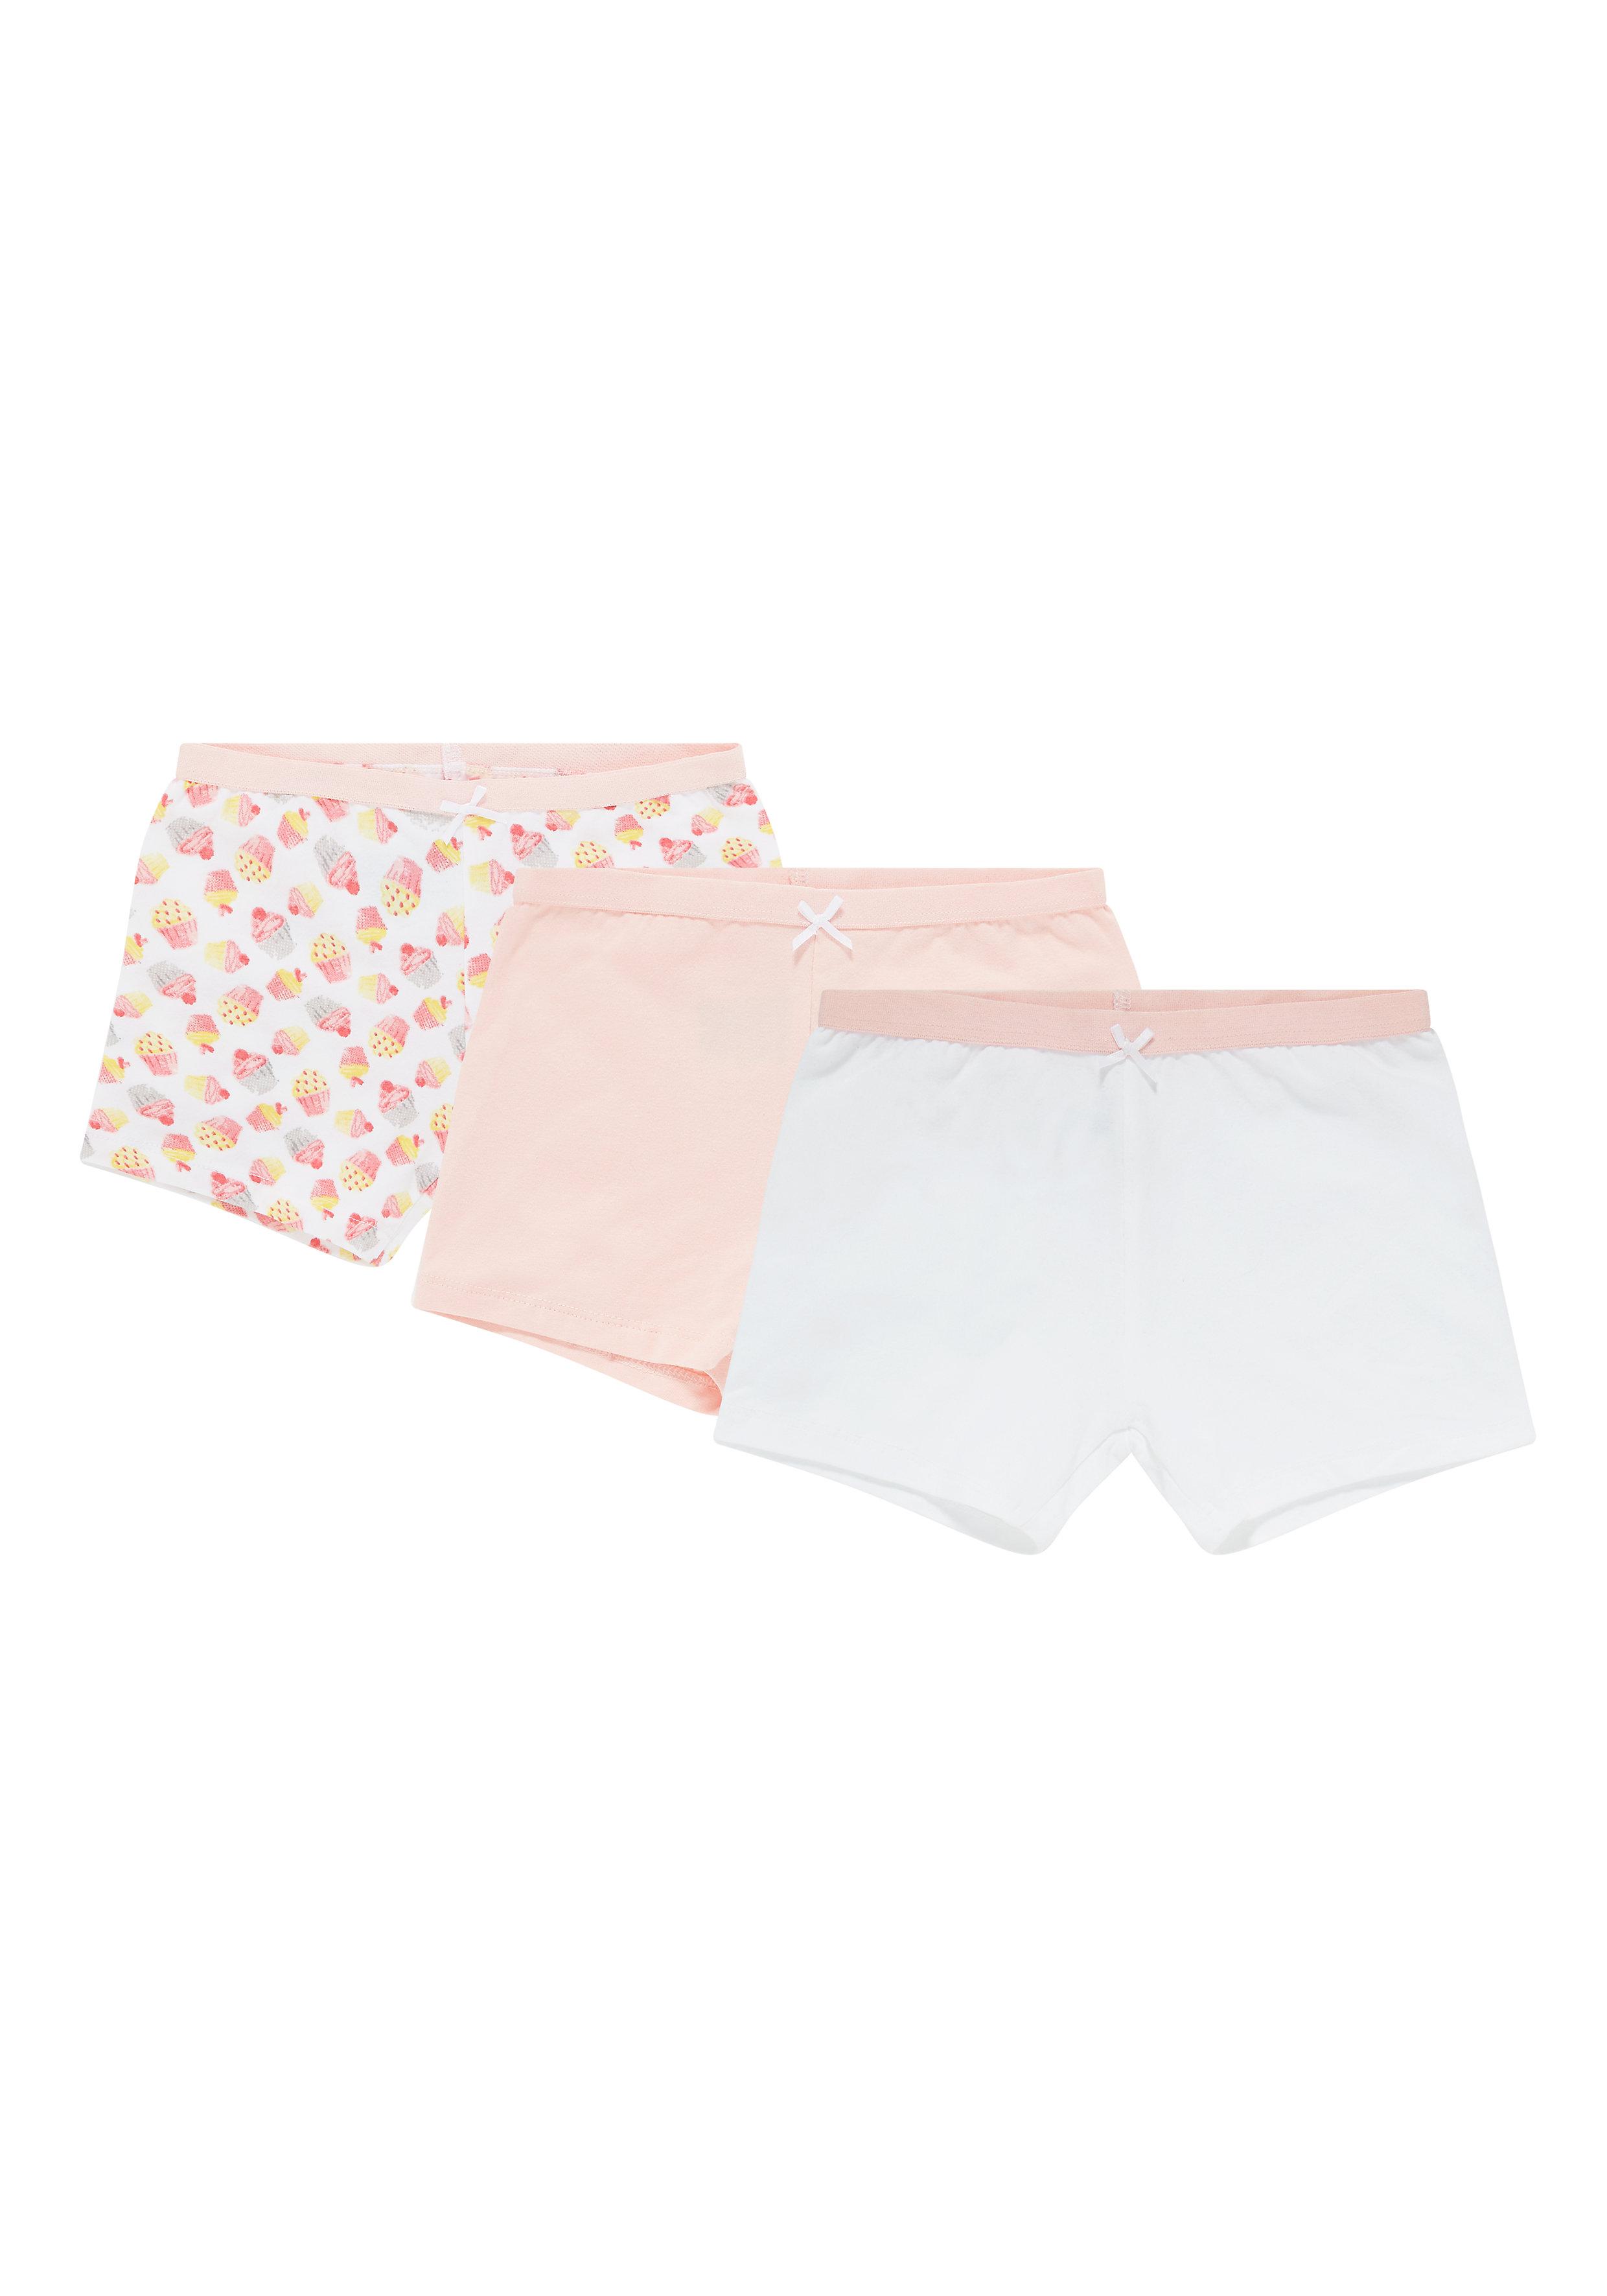 Mothercare | Girls Cupcake Shorts - 3 Pack - Pink